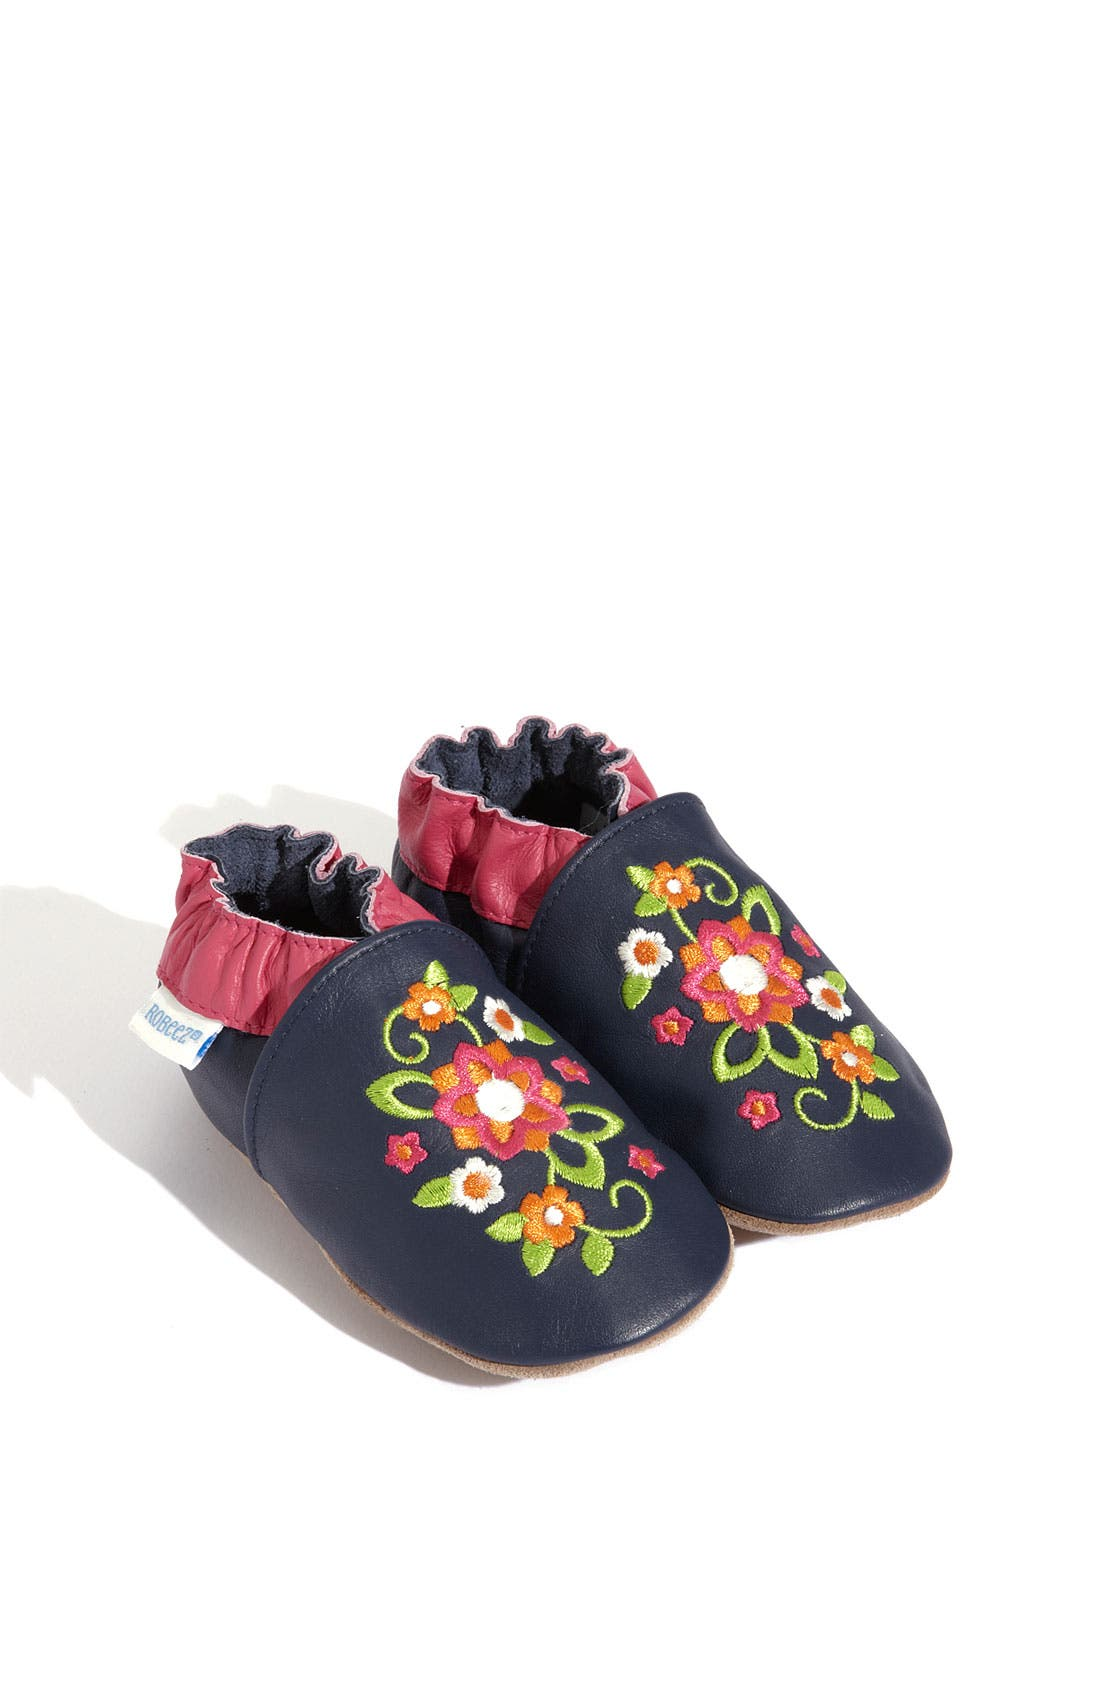 Alternate Image 1 Selected - Robeez® 'Elegant Blossom' Slip-On (Baby & Walker)